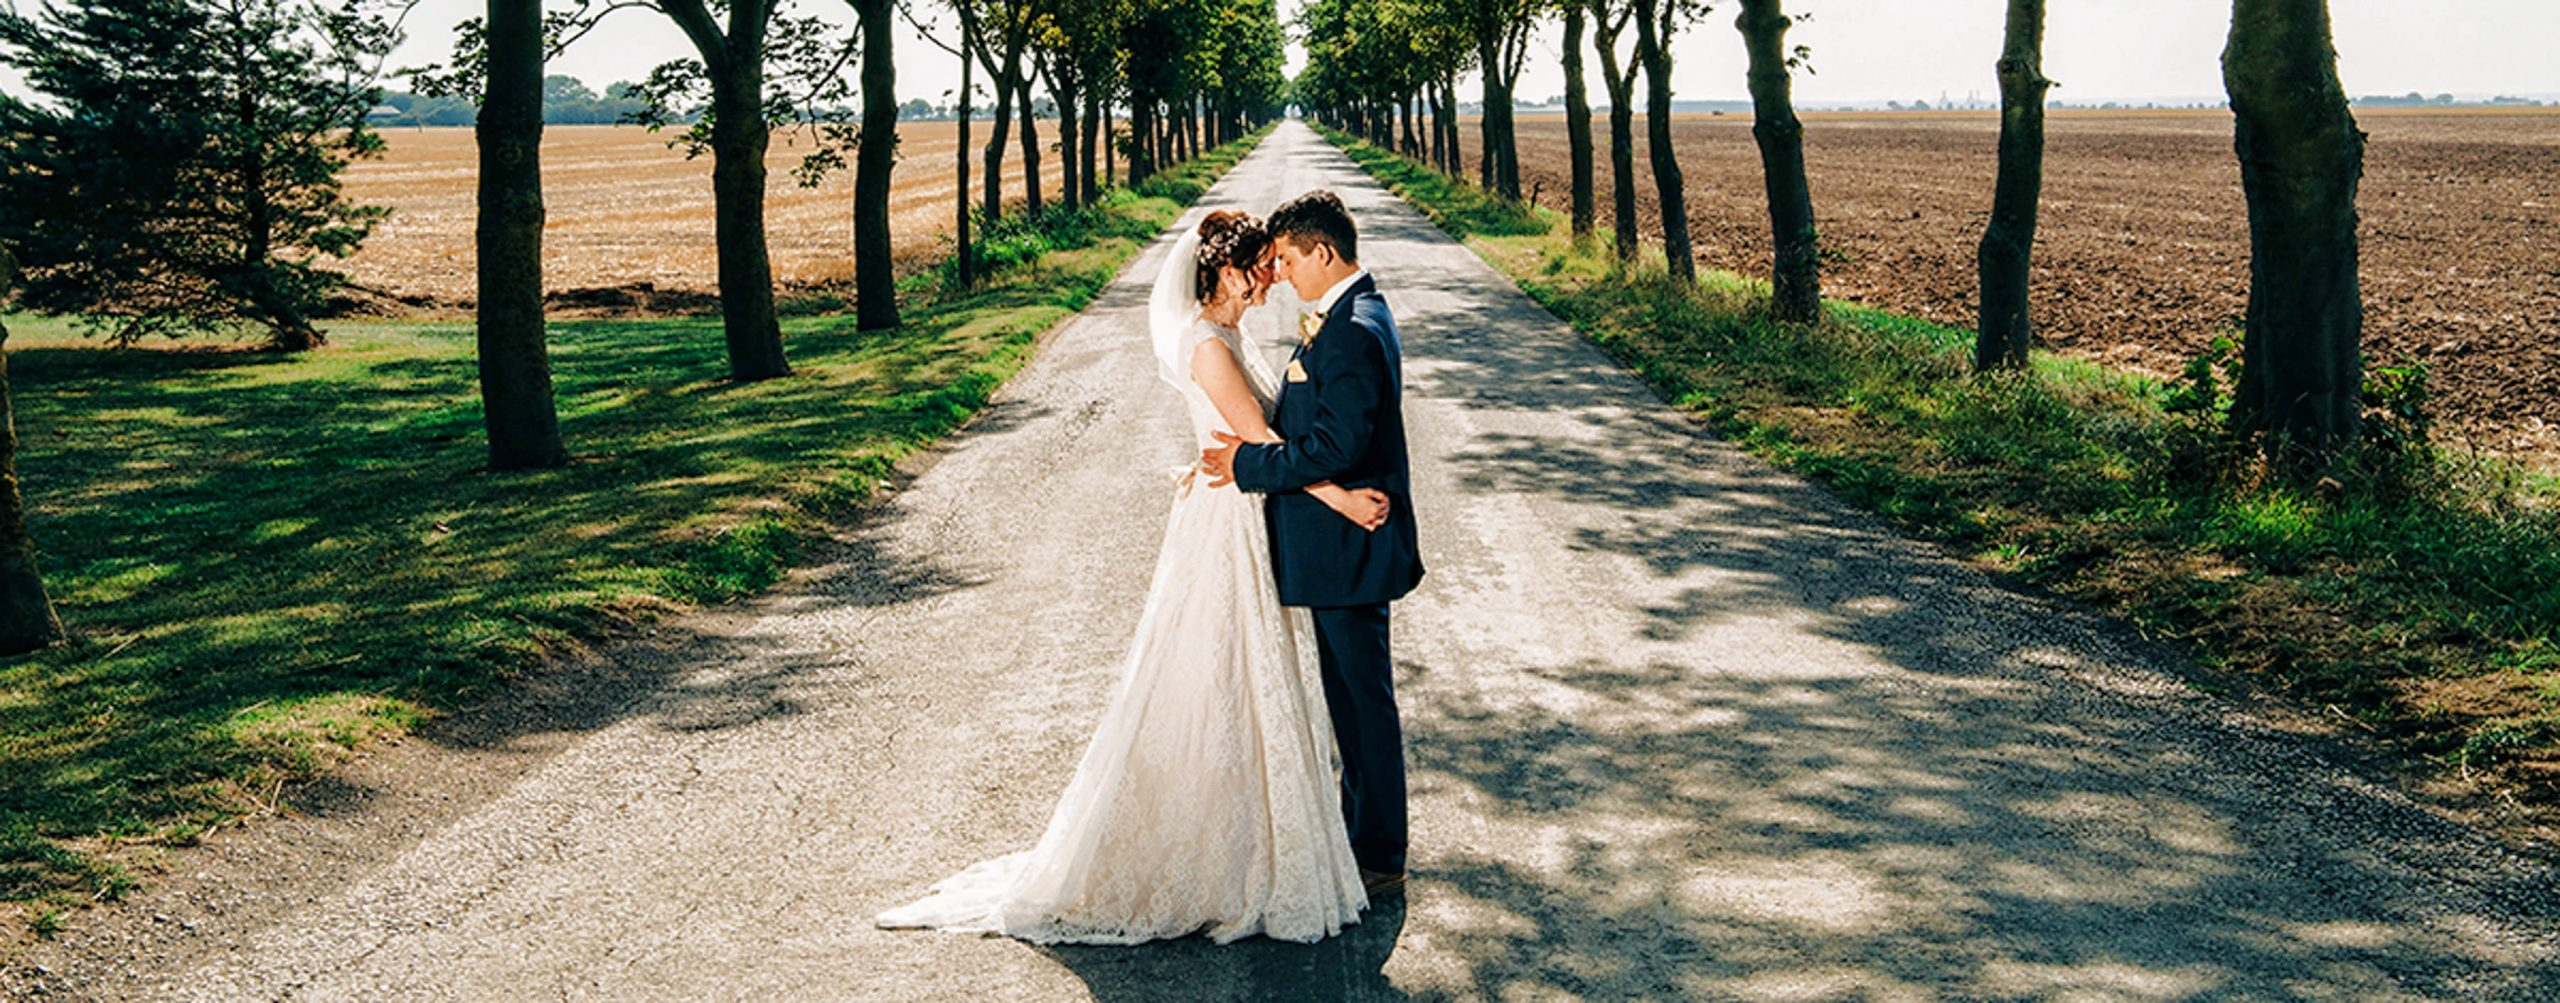 East-Yorkshire-Wedding-Photographer-Dunedin-Country-House-Weddings-Hull-Abraham-Photography-04